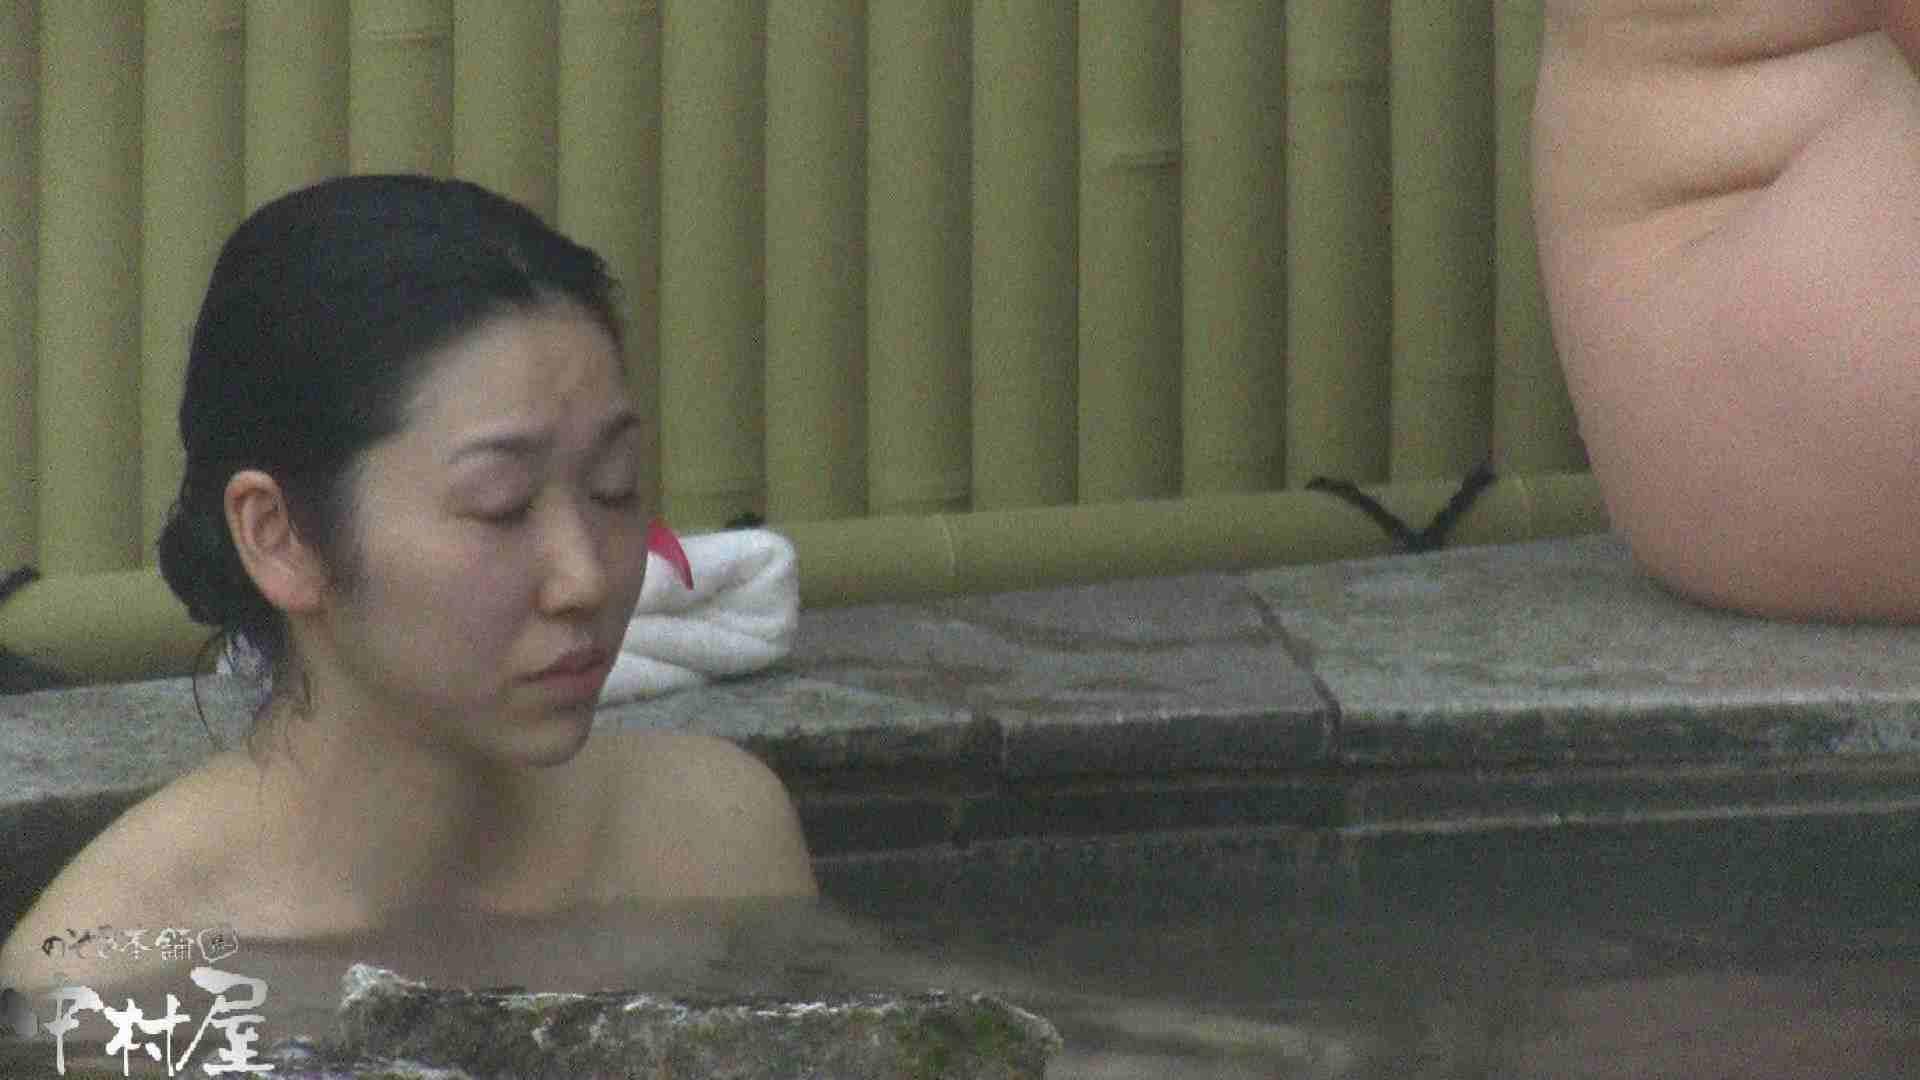 Aquaな露天風呂Vol.917 OLセックス   盗撮  102画像 43